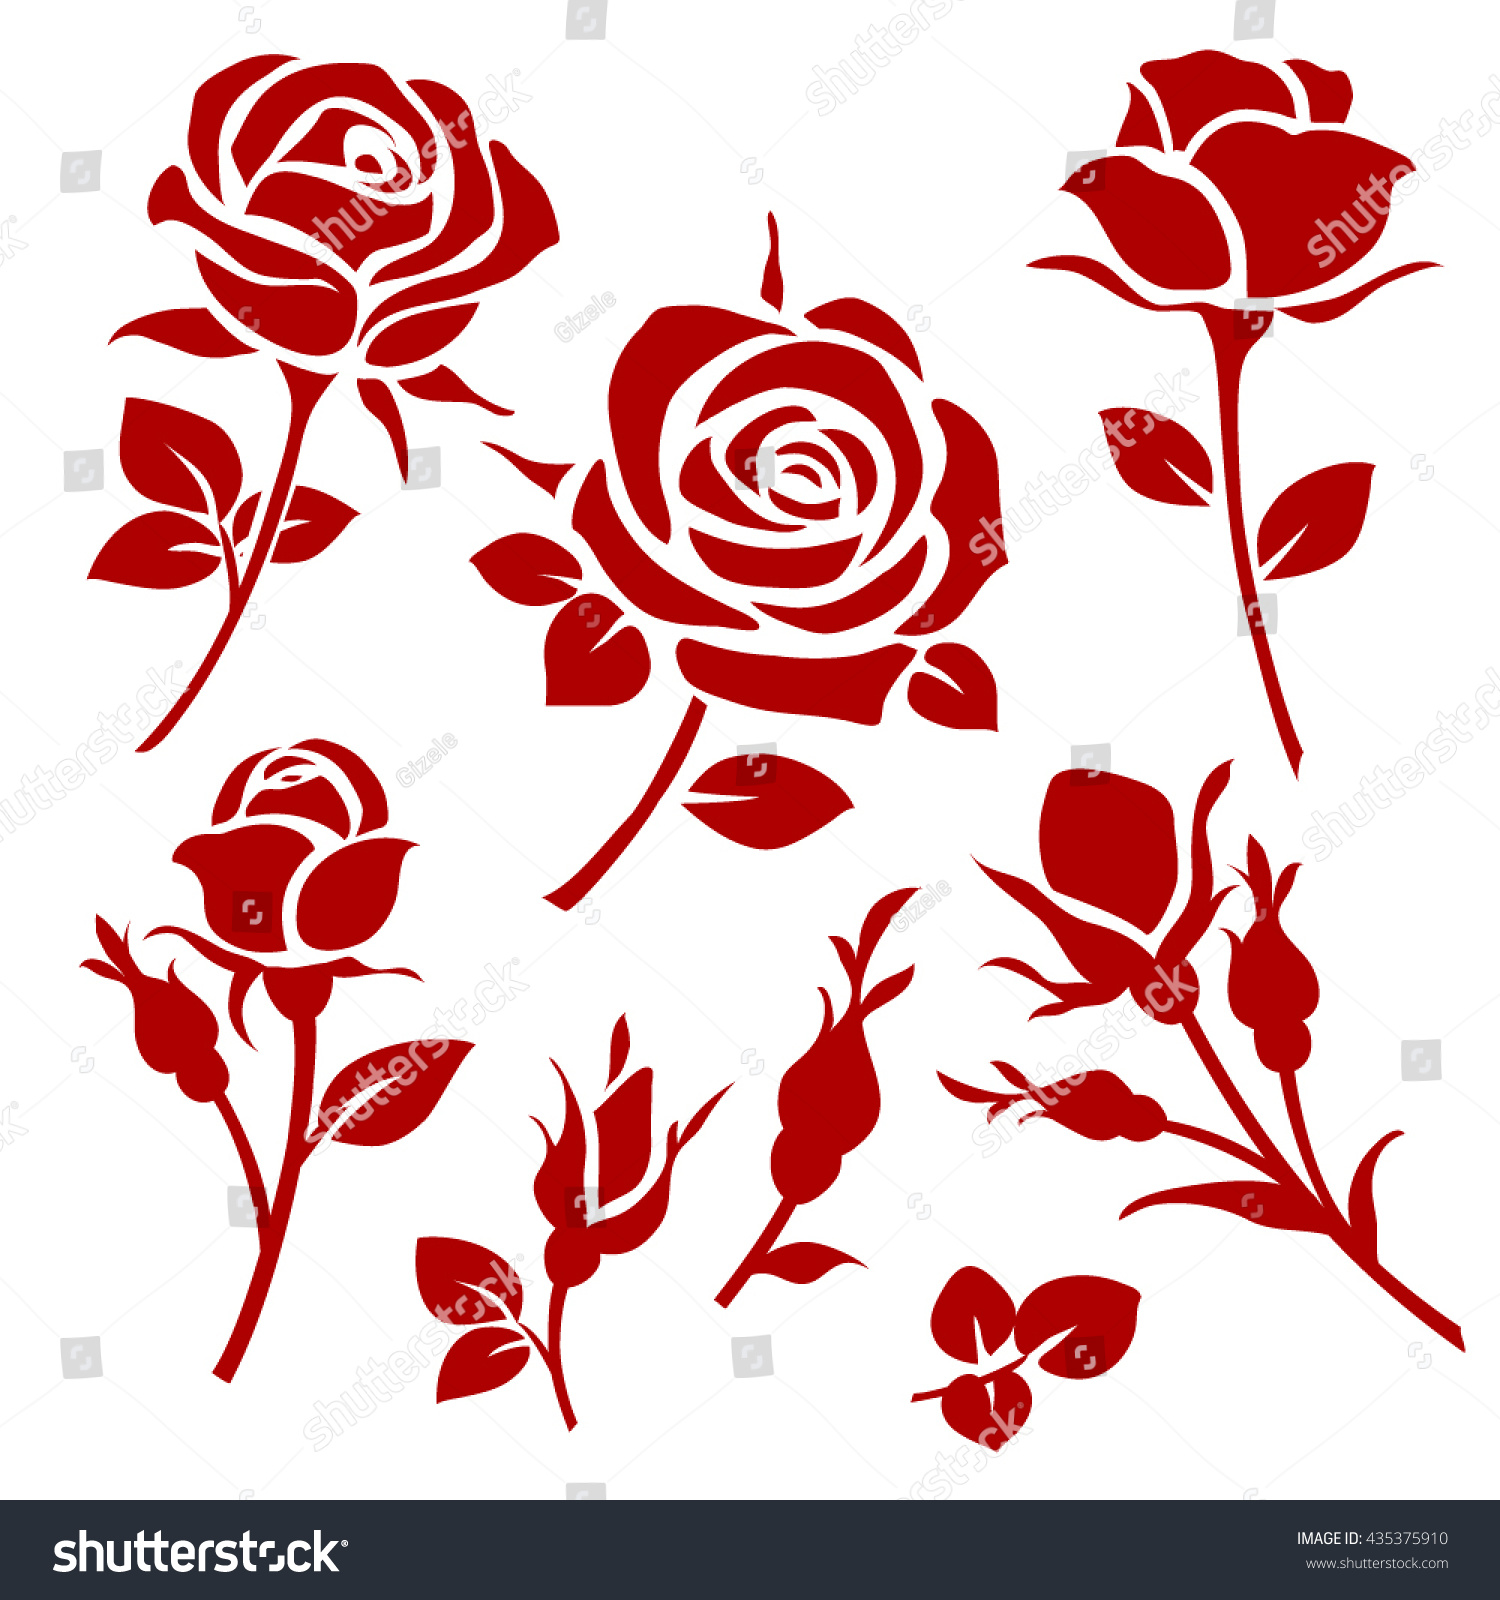 Vector rose icon spring decorative rose 435375910 vector rose icon spring decorative rose and bud silhouettes voltagebd Choice Image